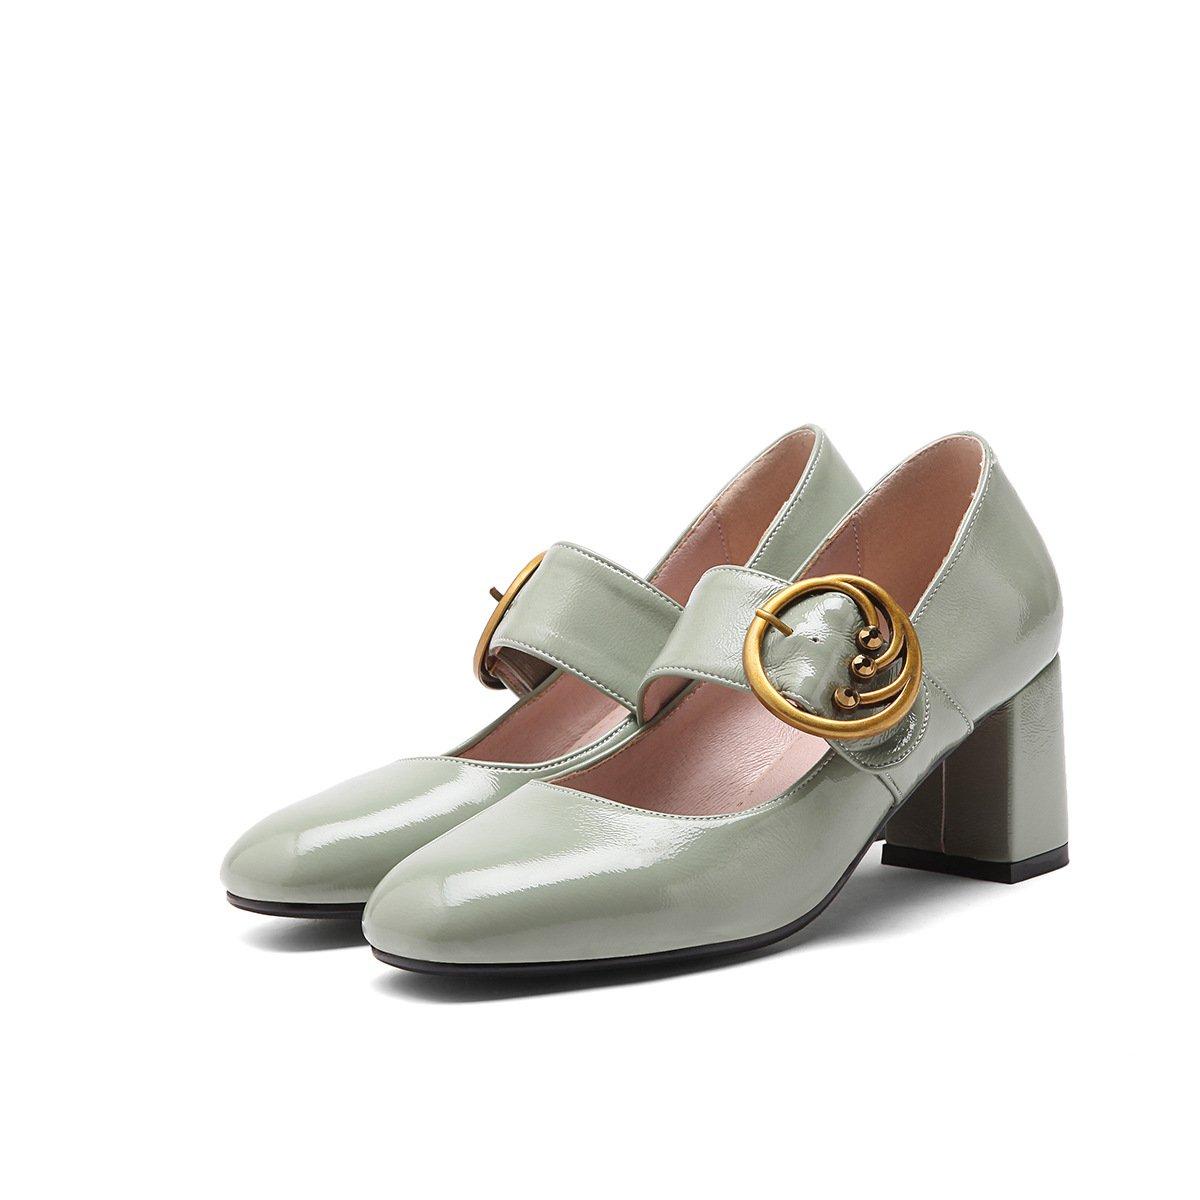 CXQ-Heels QIN&X Damen Square Toe Blockabsatz Flachen Grün Mund Schuhe Light Grün Flachen 75991e